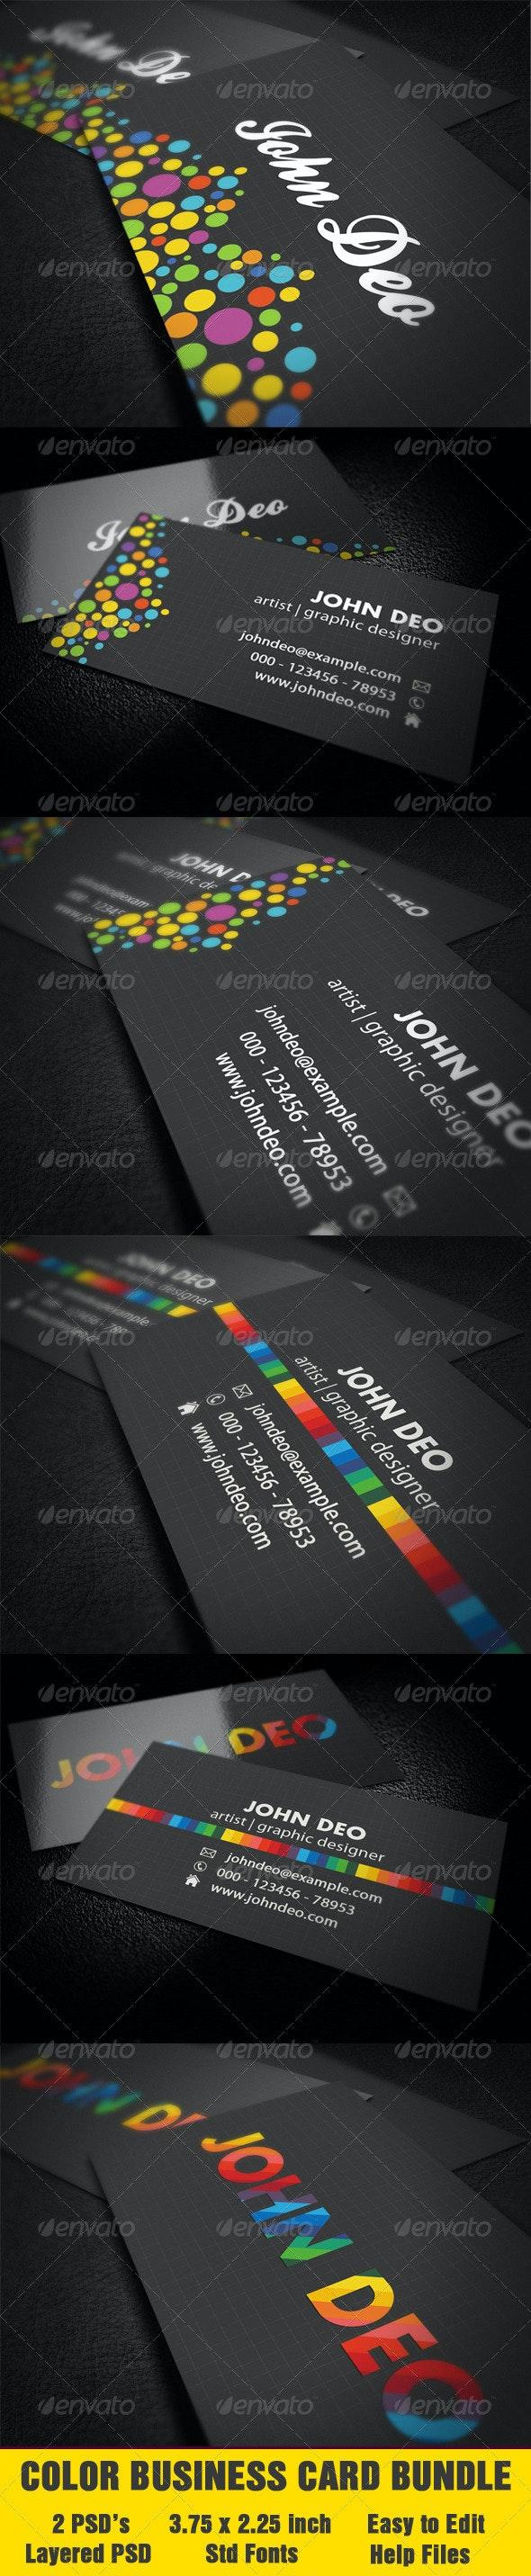 Color Business Card Bundle - 2 Cards - Corporate Business Cards